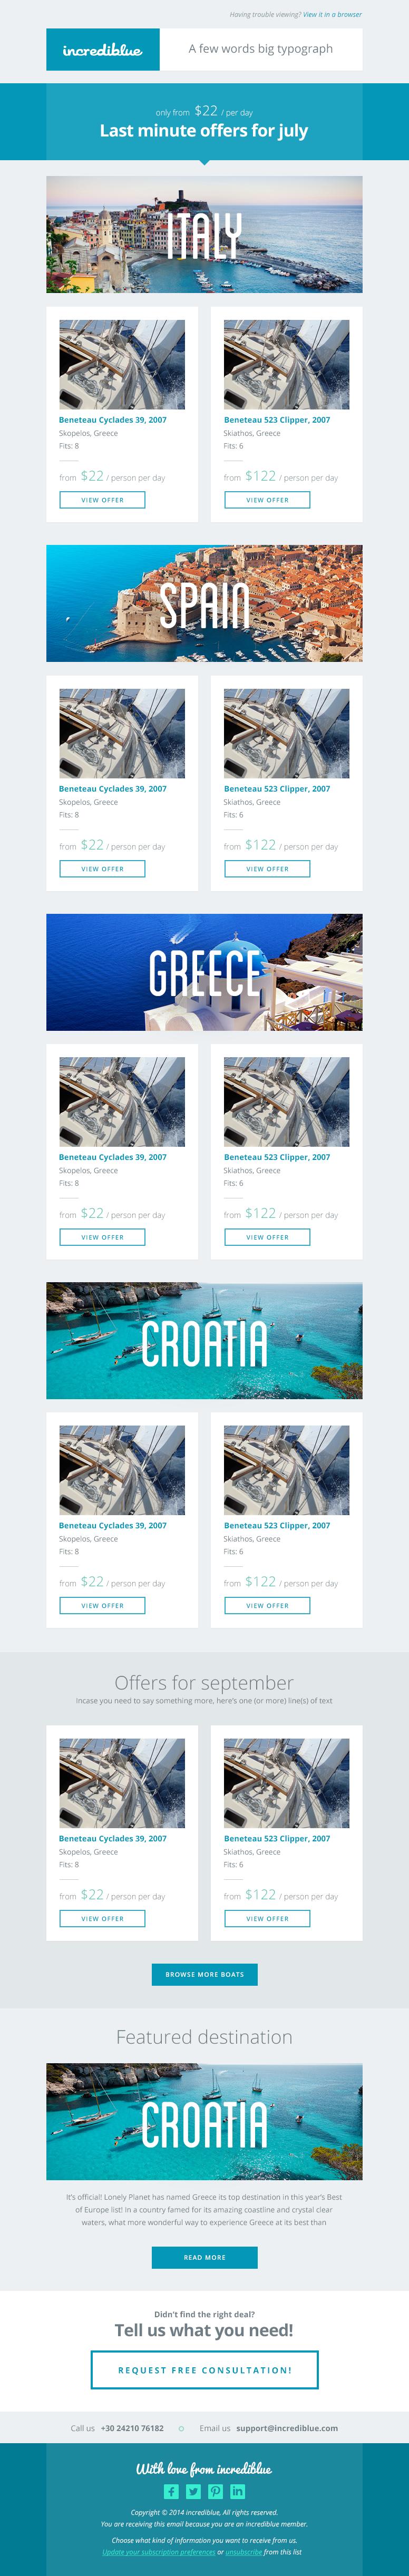 Newsletter offers